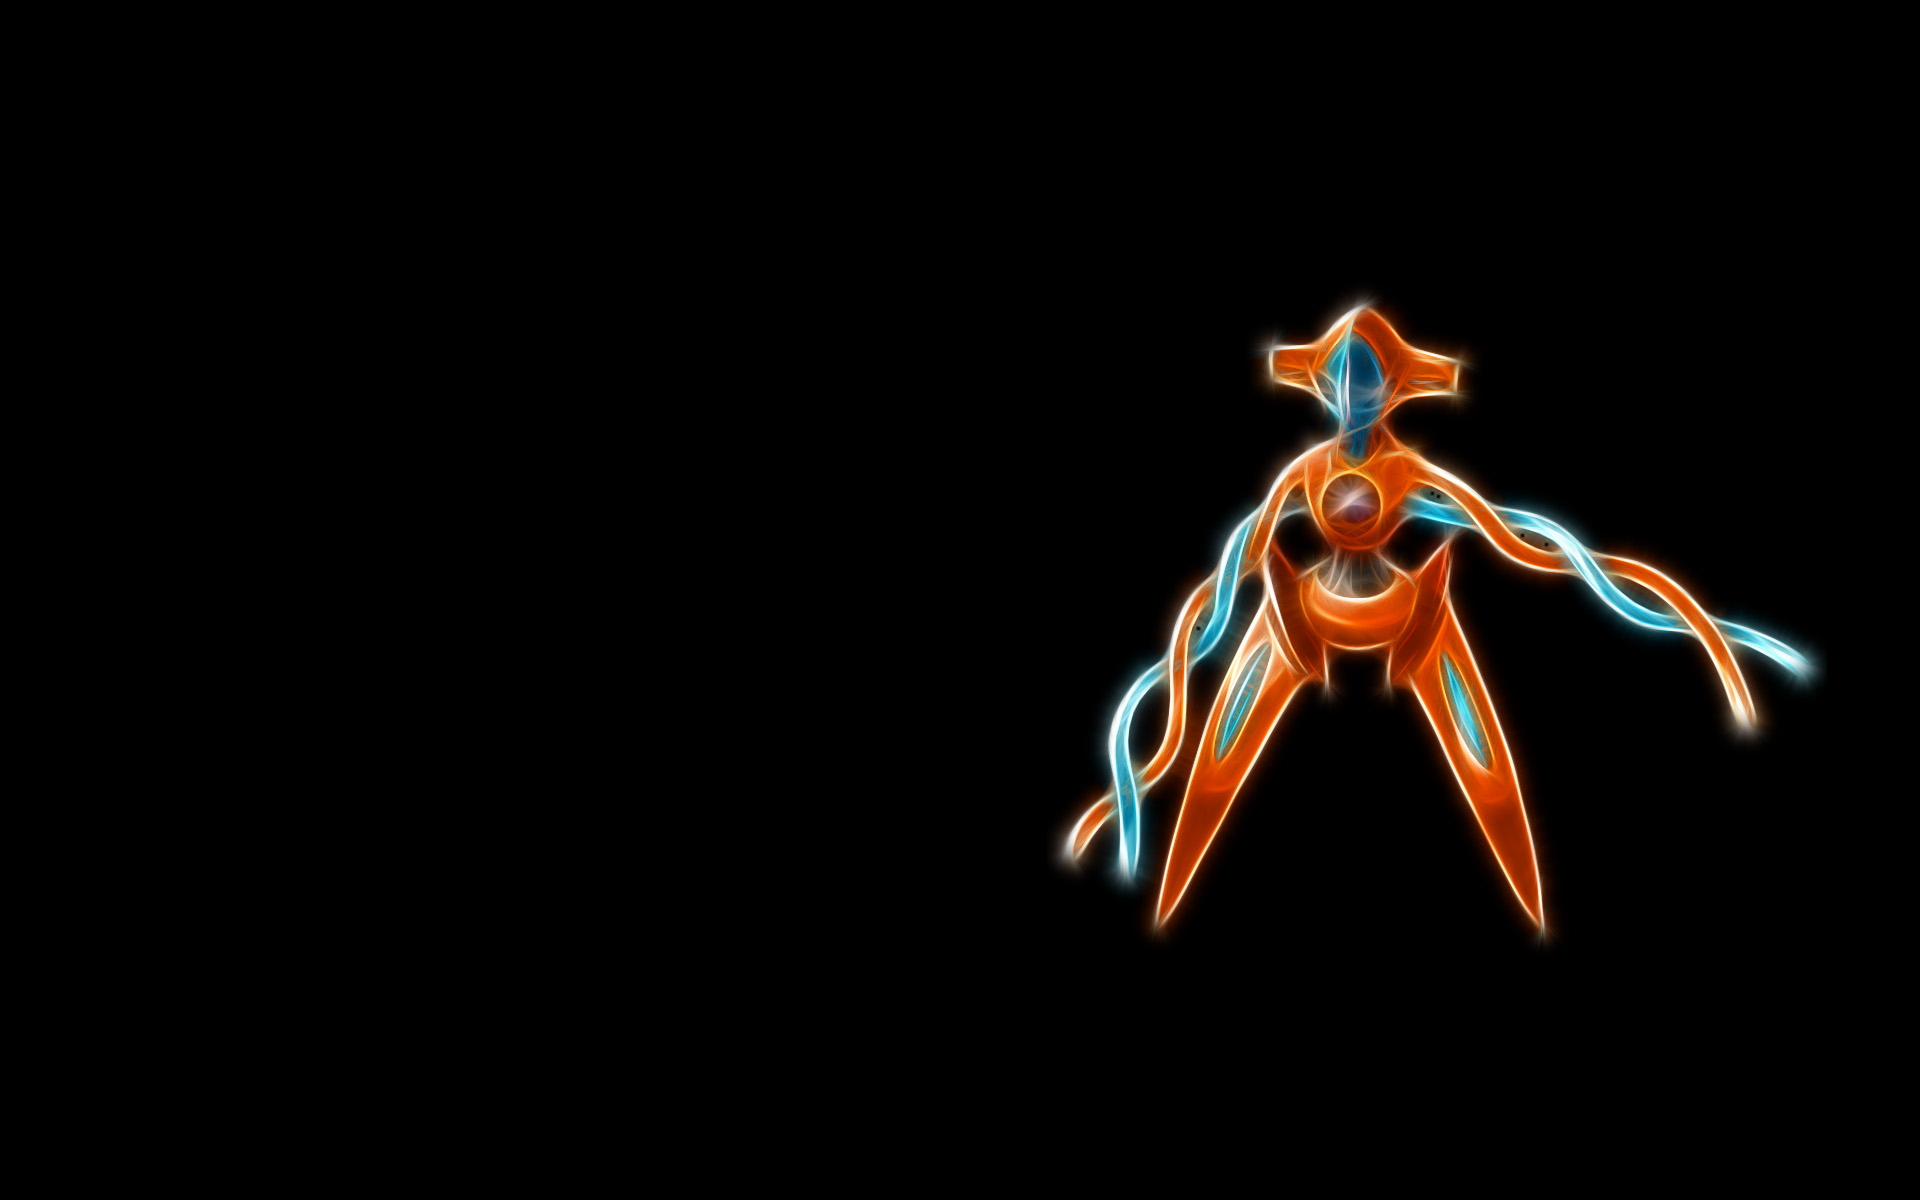 Pokémon Full HD Wallpaper and Background | 1920x1200 | ID ...